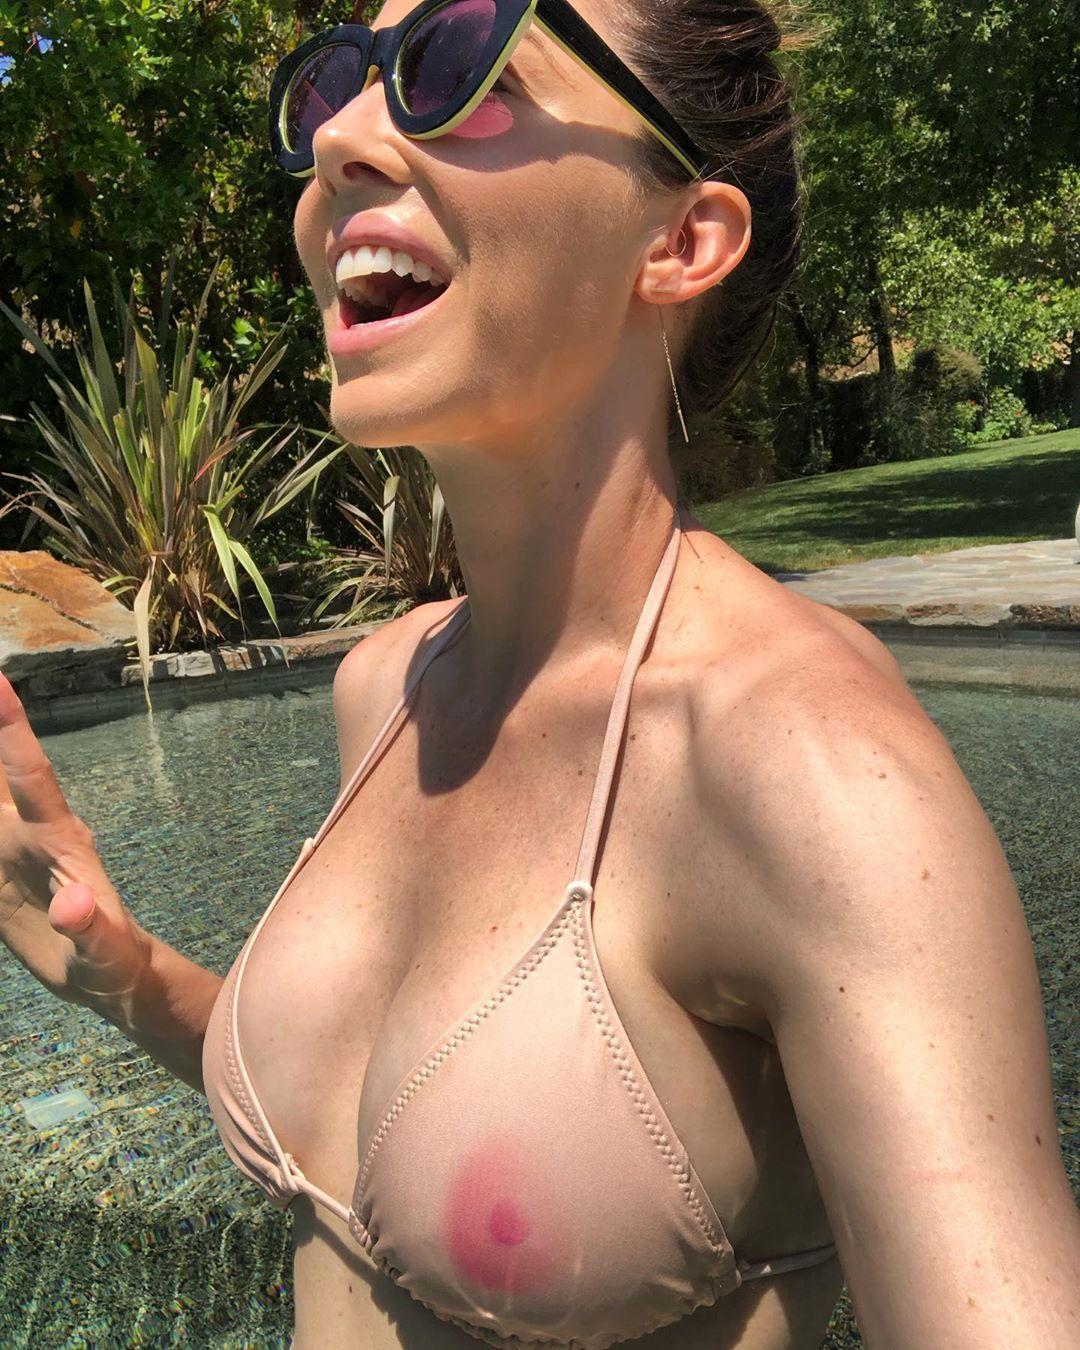 Whitney Cummings Nude Pics